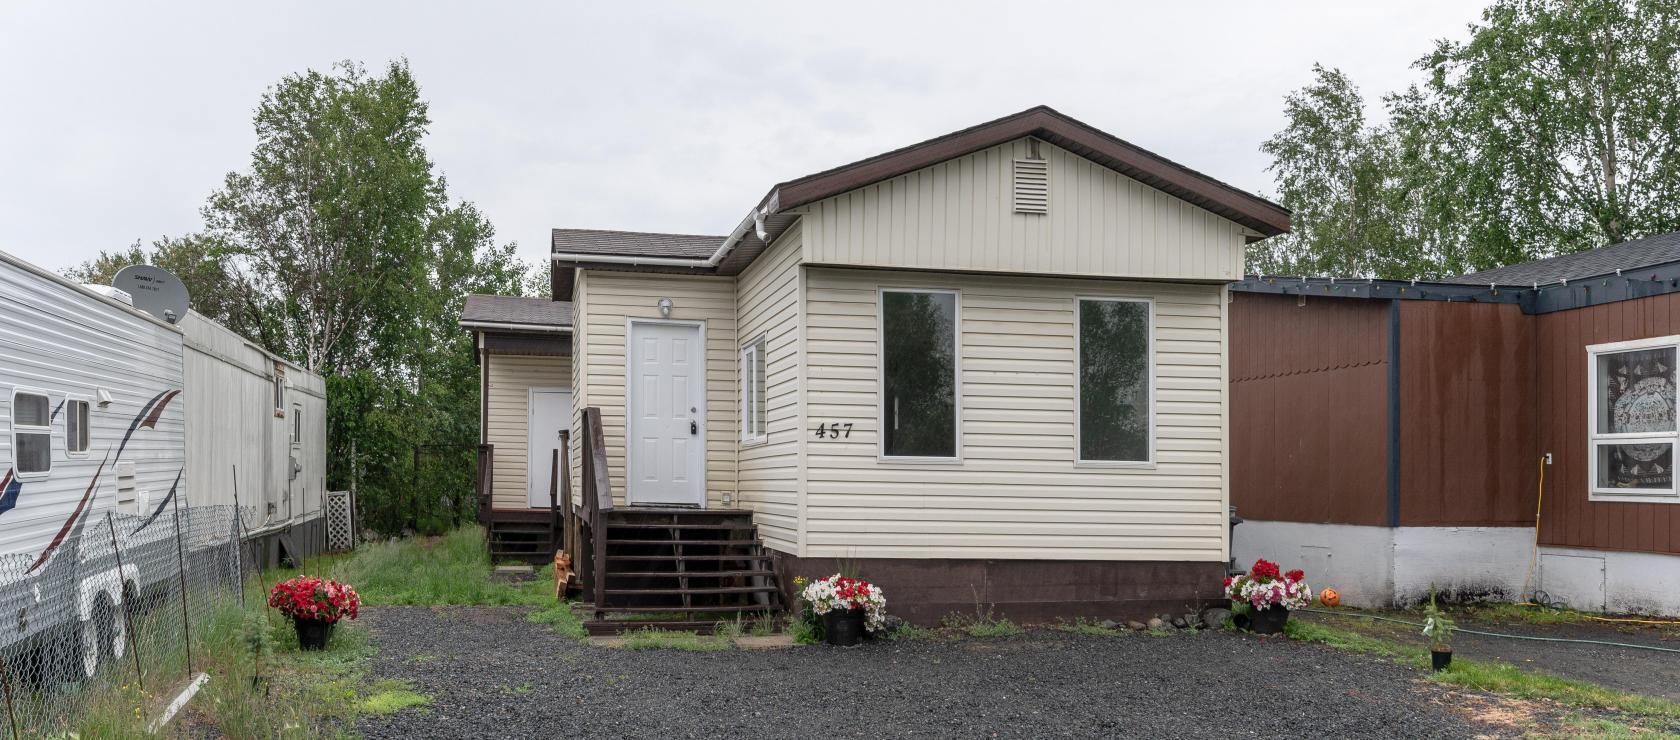 457 Norseman Drive, Frame Lake, Yellowknife 2